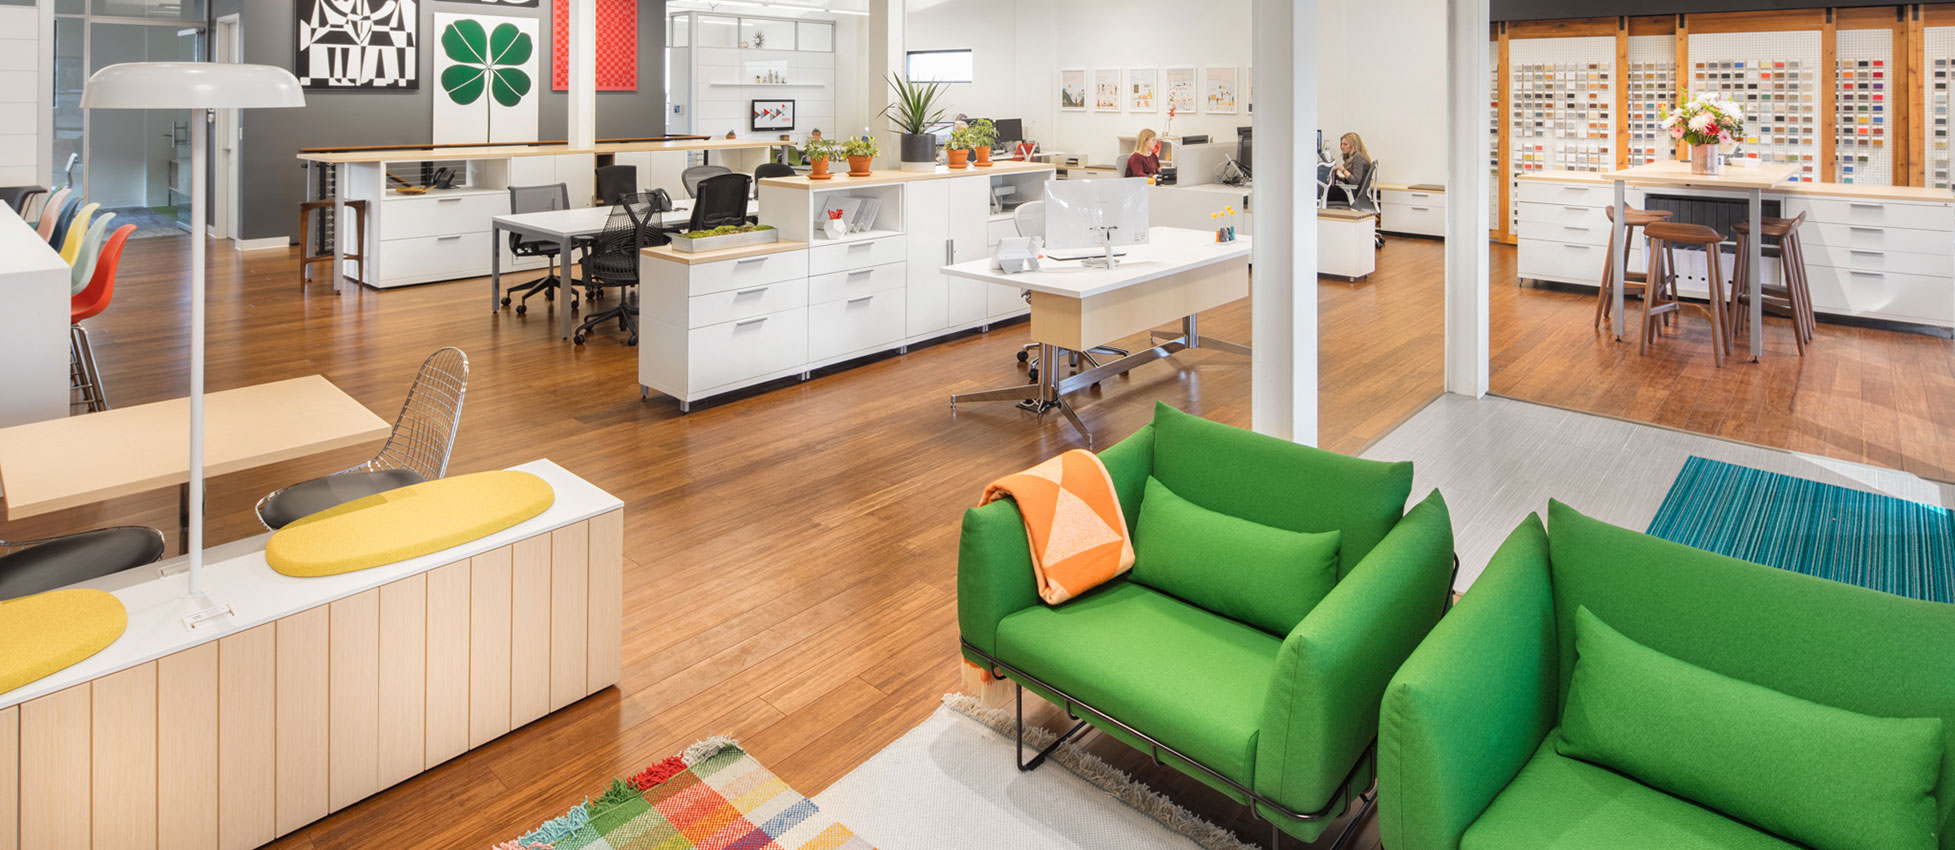 Interior Design School Sioux Falls